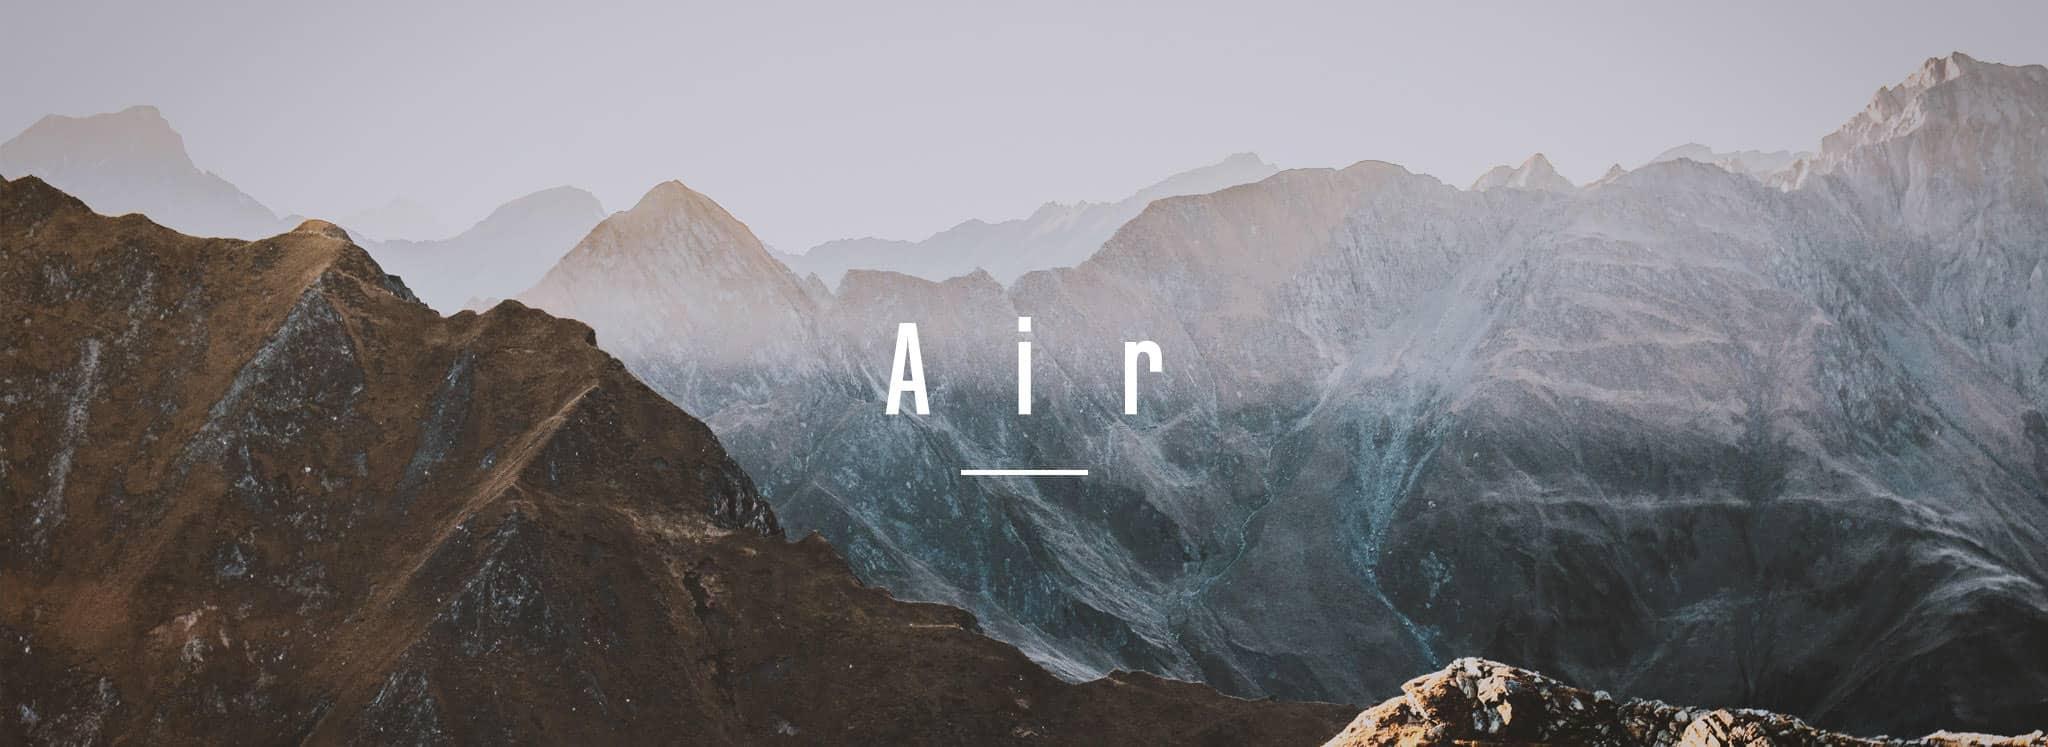 Air  – Adventure Session